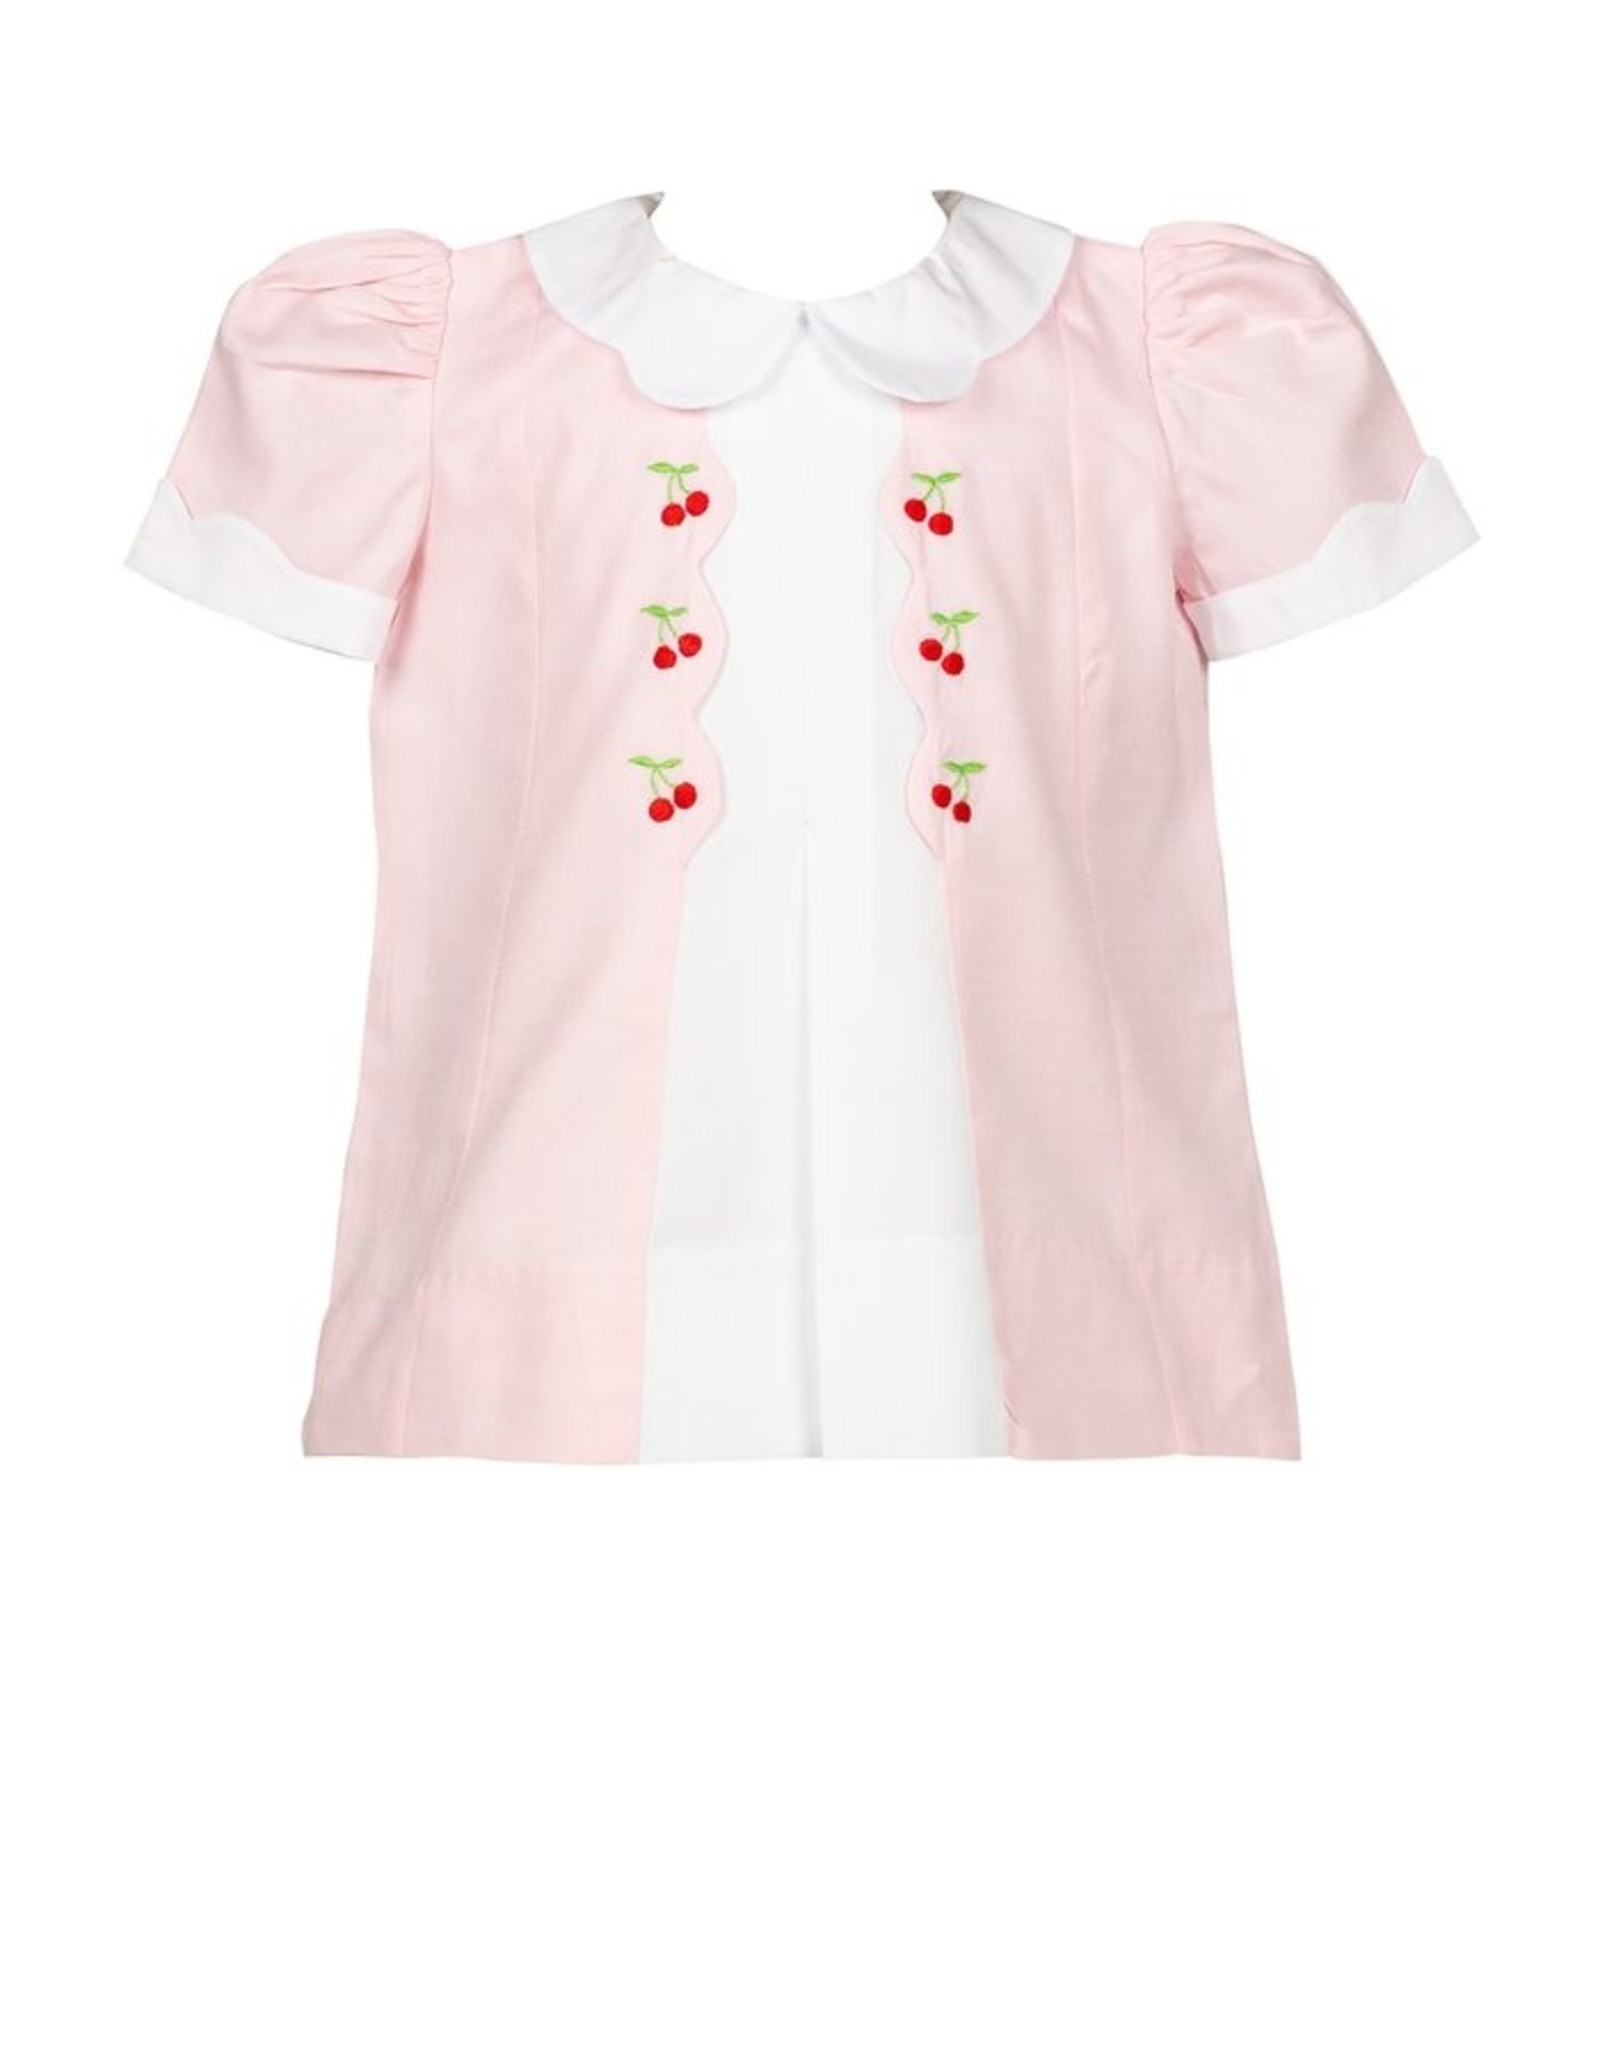 The Proper Peony Clara Cherry Dress